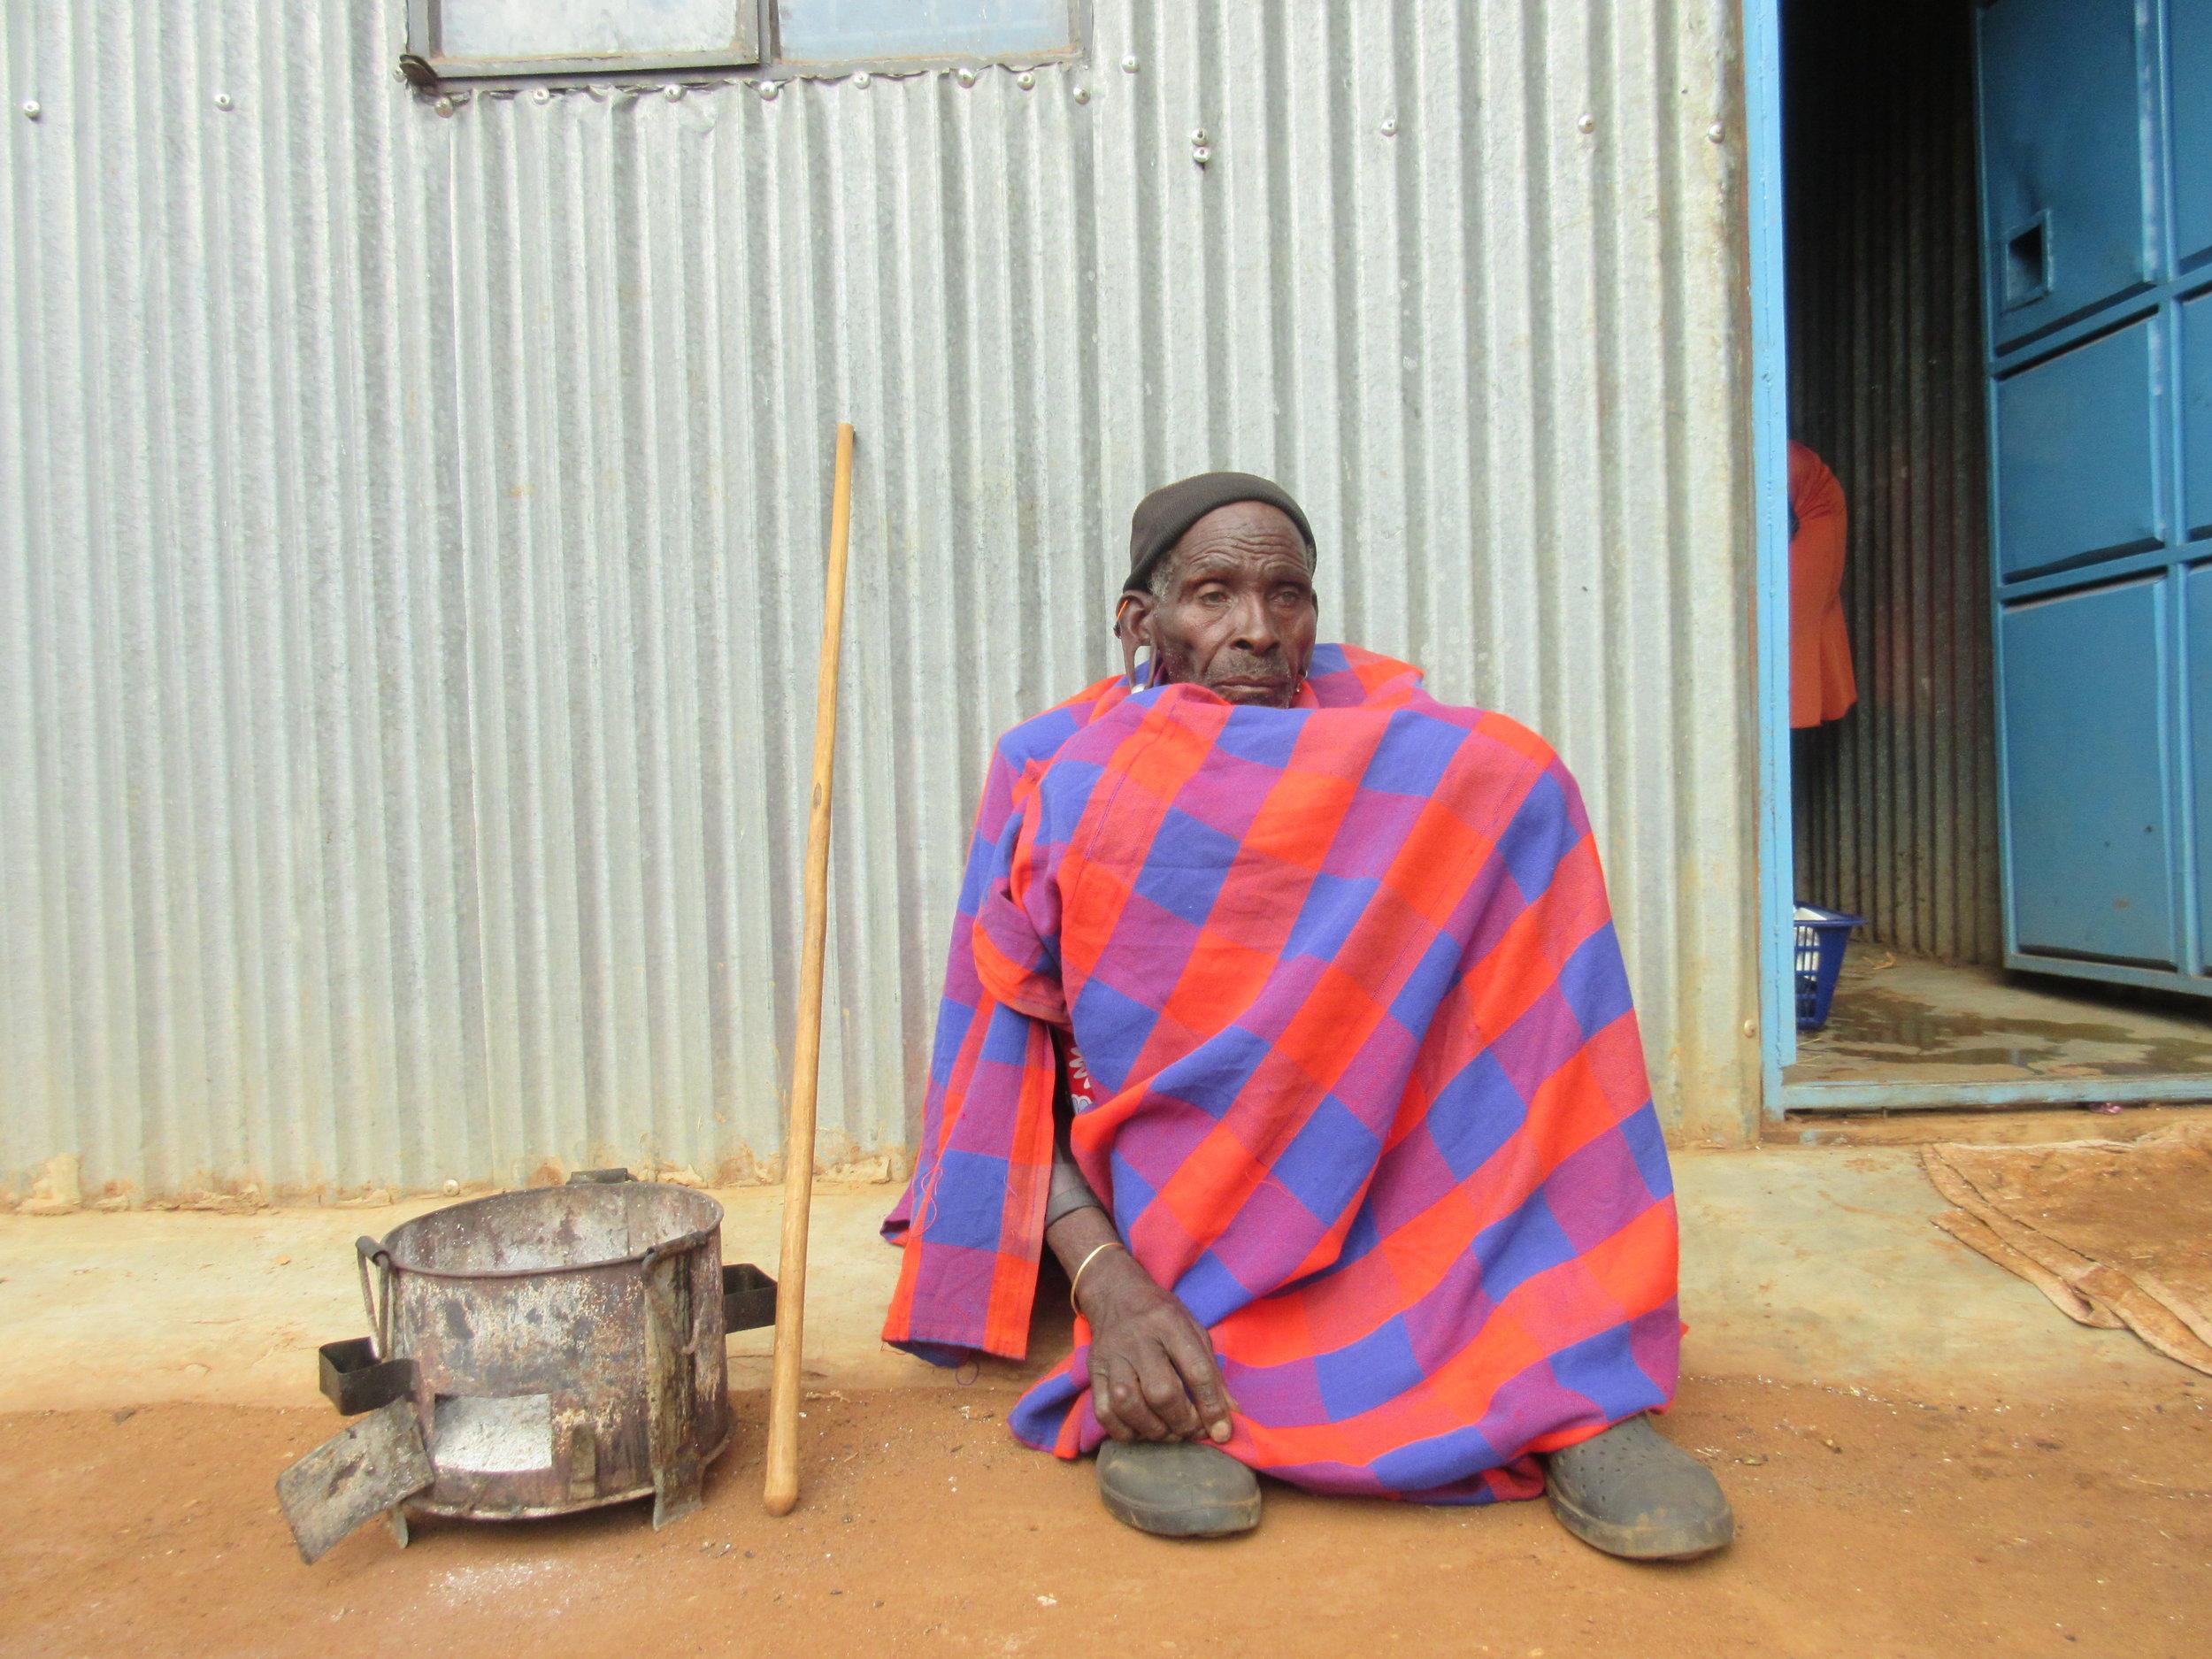 Sankau, resting, outside his friend's home